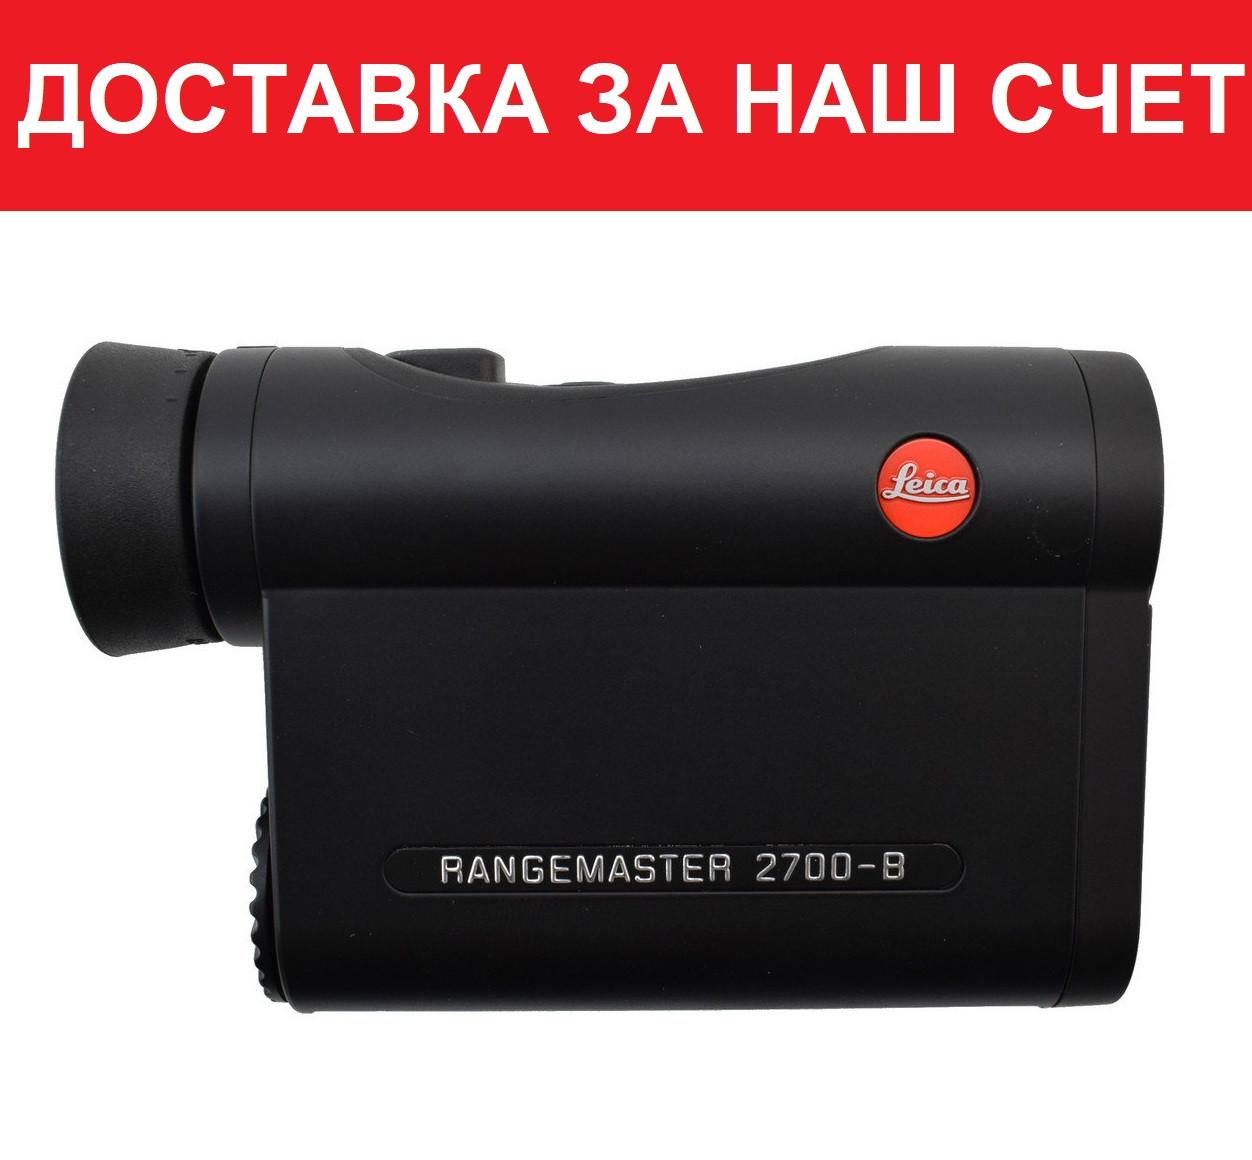 Дальномер Leica Rangemaster CRF 2700-B